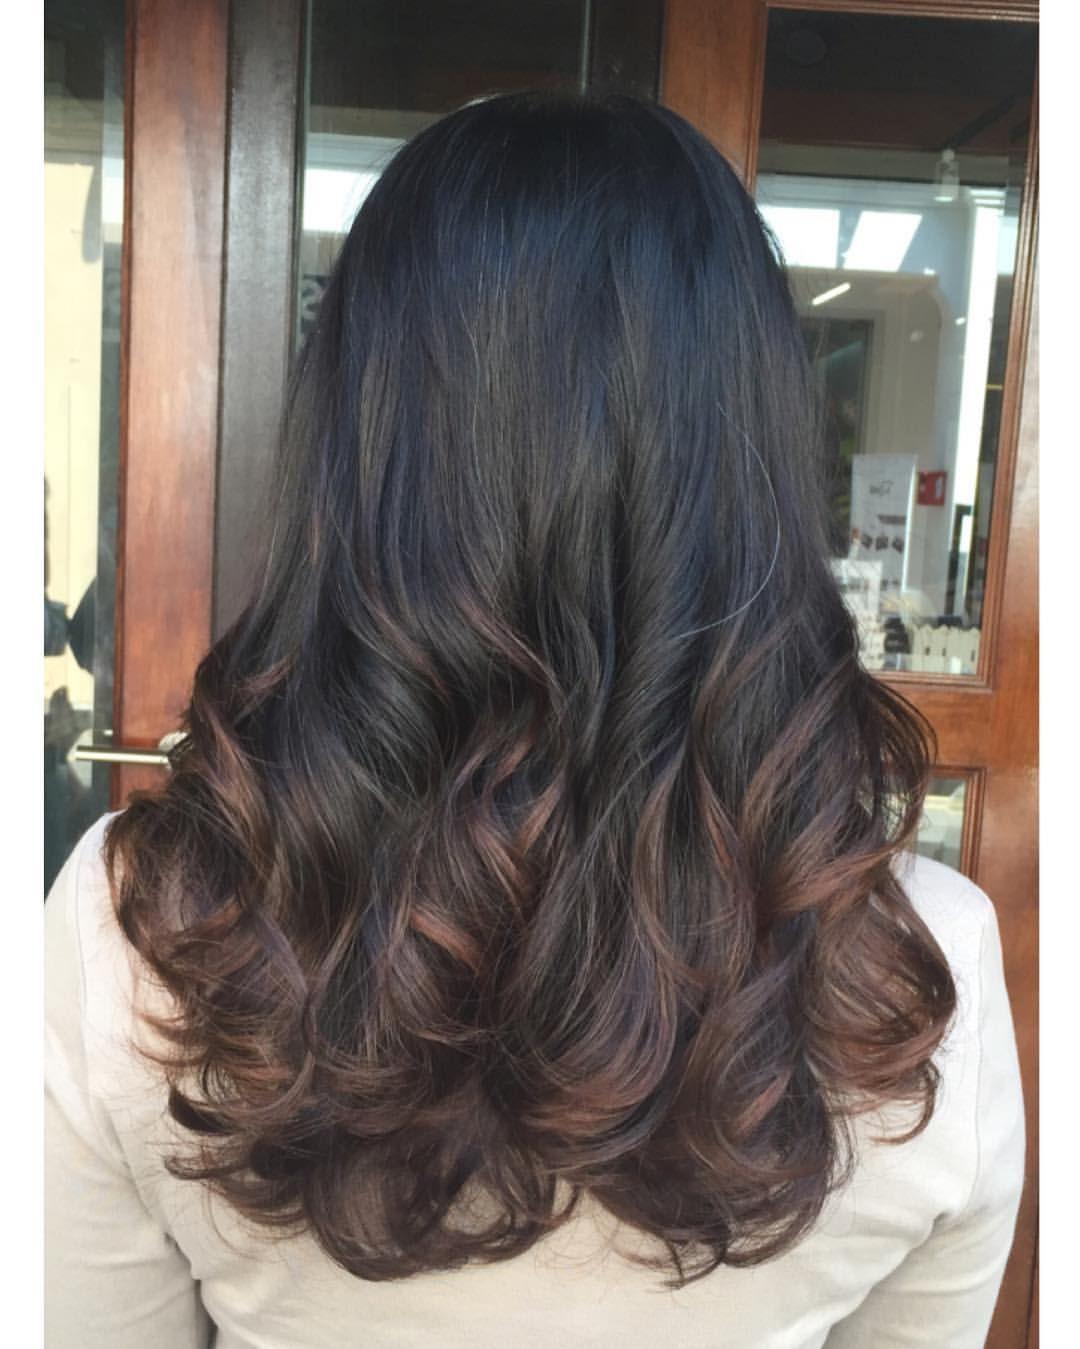 Picasso S Inspiration Loose Soft Curls Digital Perm By Carmen Chew Picassoperm 62910691 Picassohairstud Digital Perm Curls For Long Hair Long Hair Styles